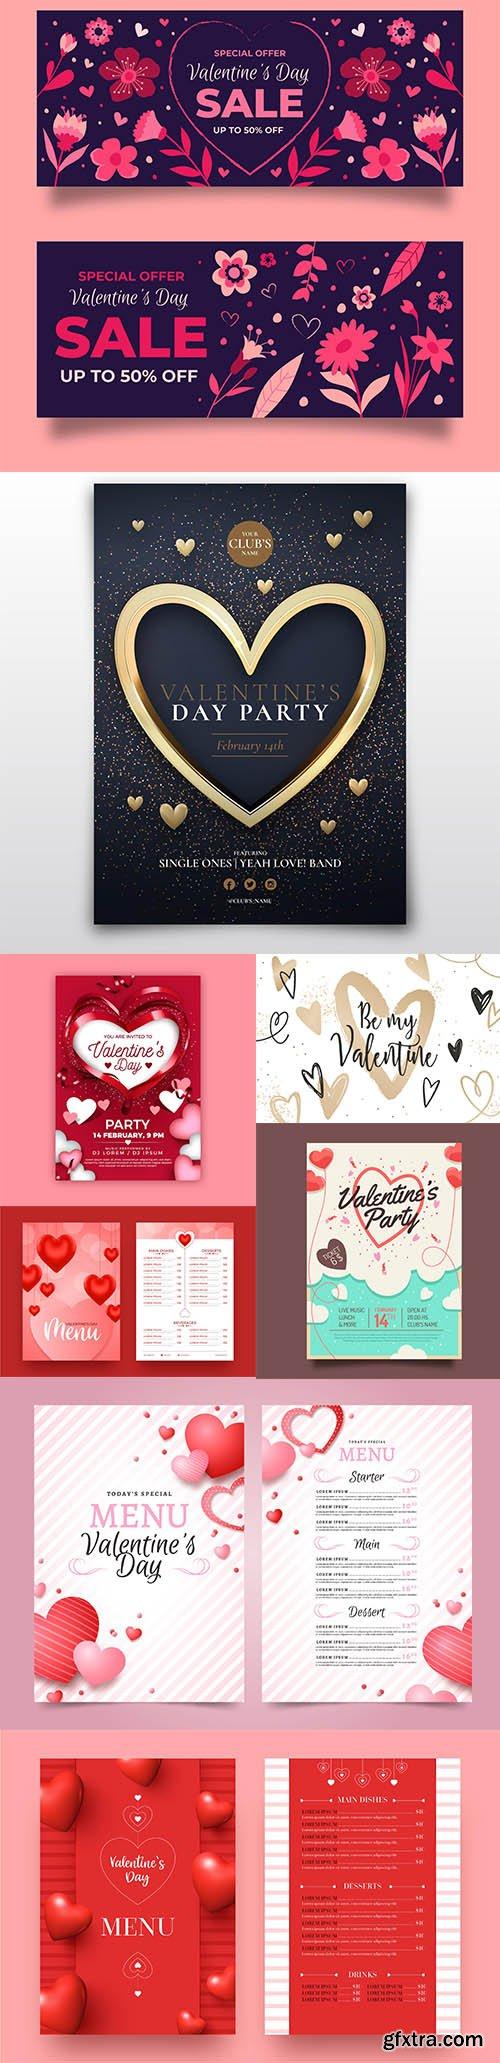 Happy Valentines day vector collection vol 5